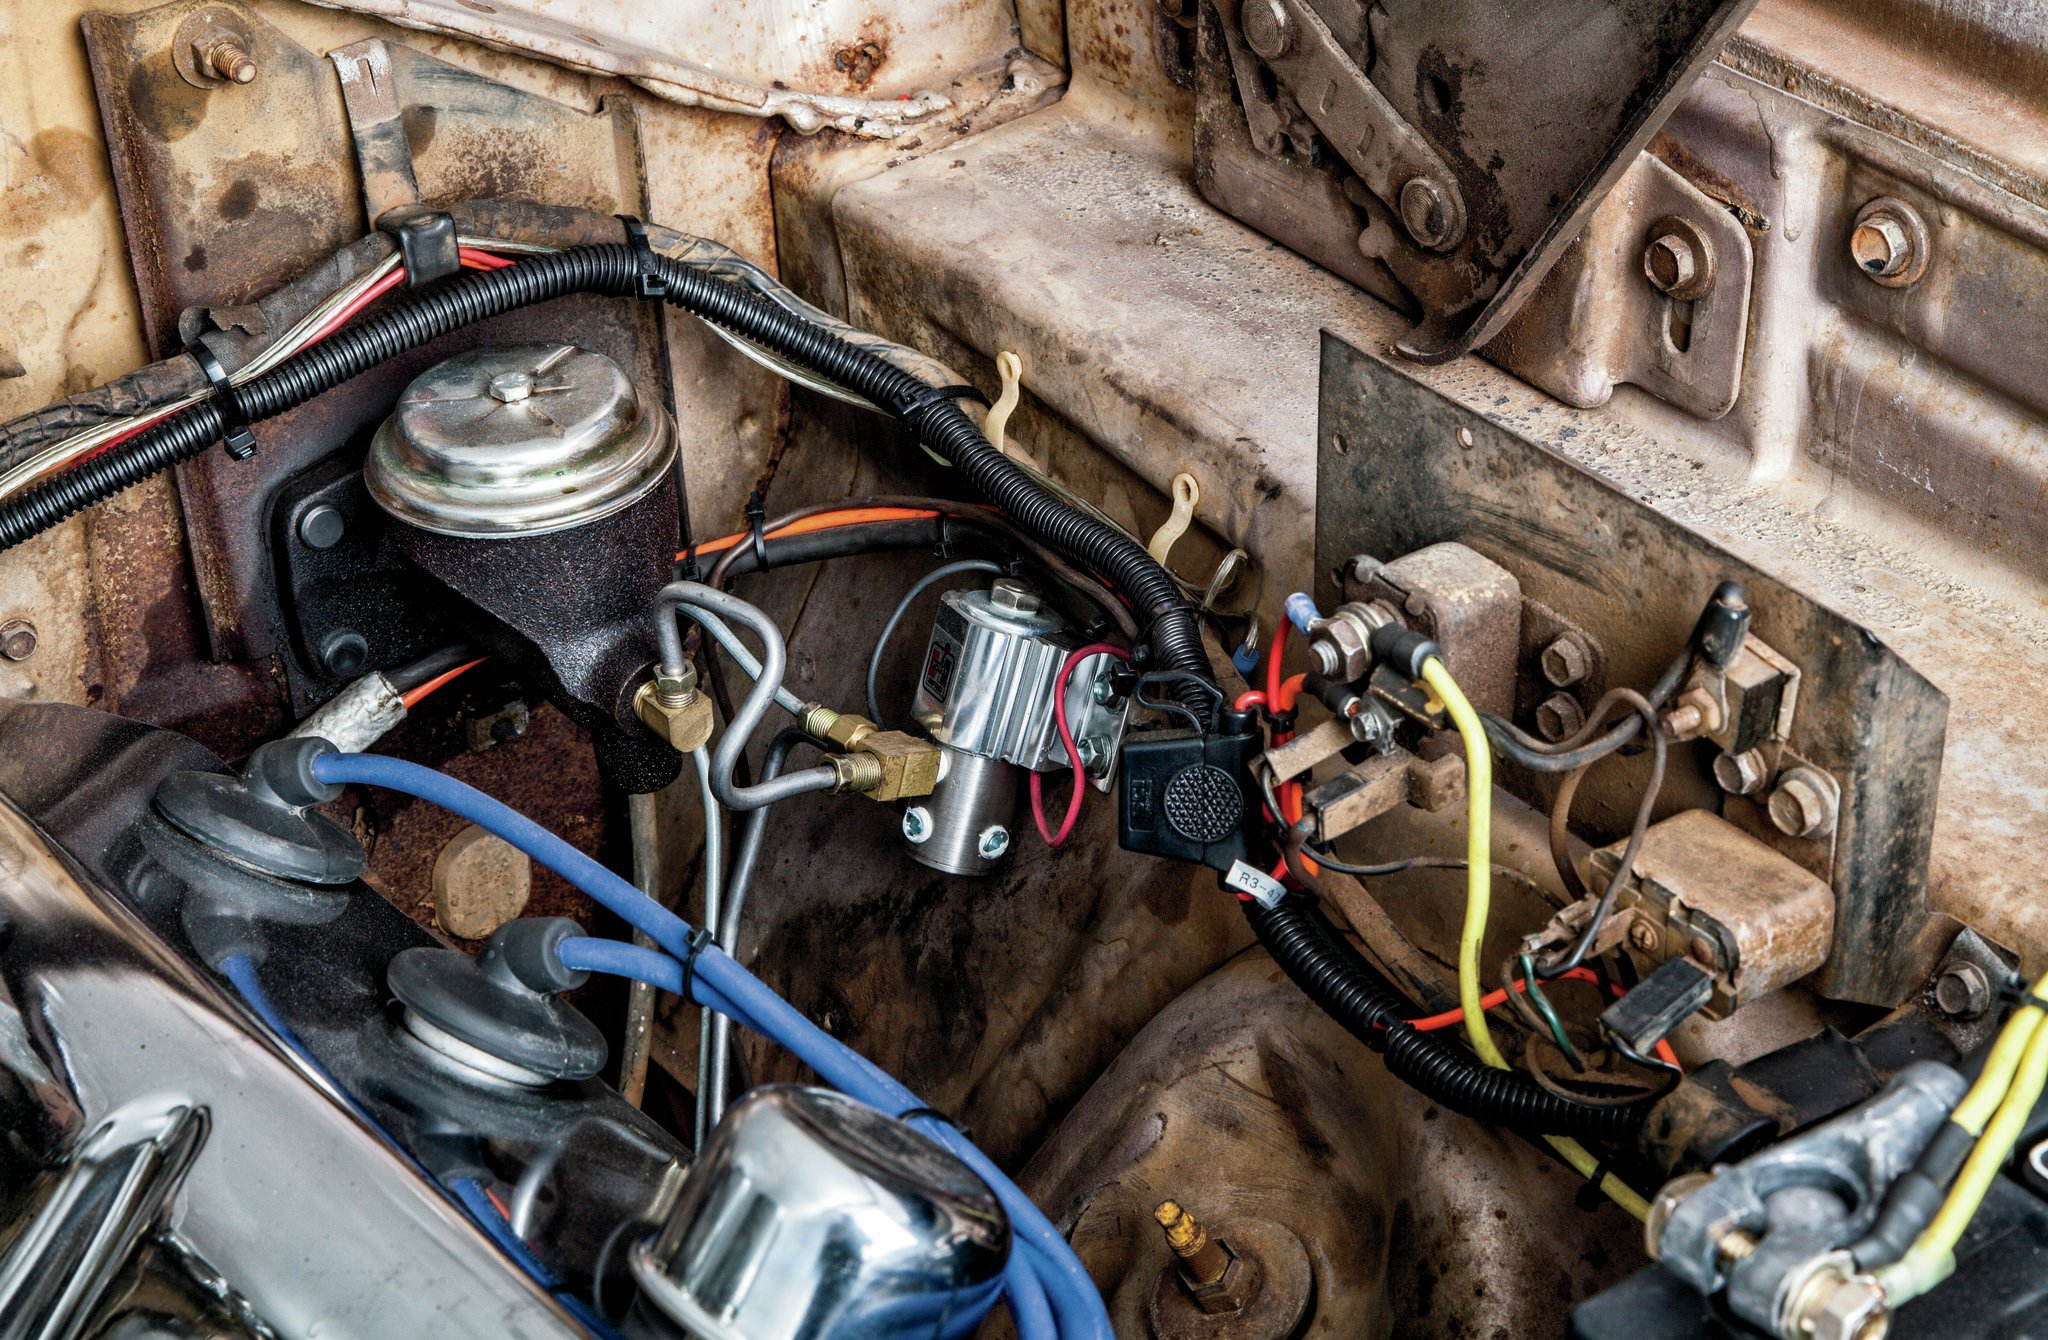 medium resolution of 1966 dodge coronet unrestored 426ci hemi engine wiring on firewall rh hotrod com